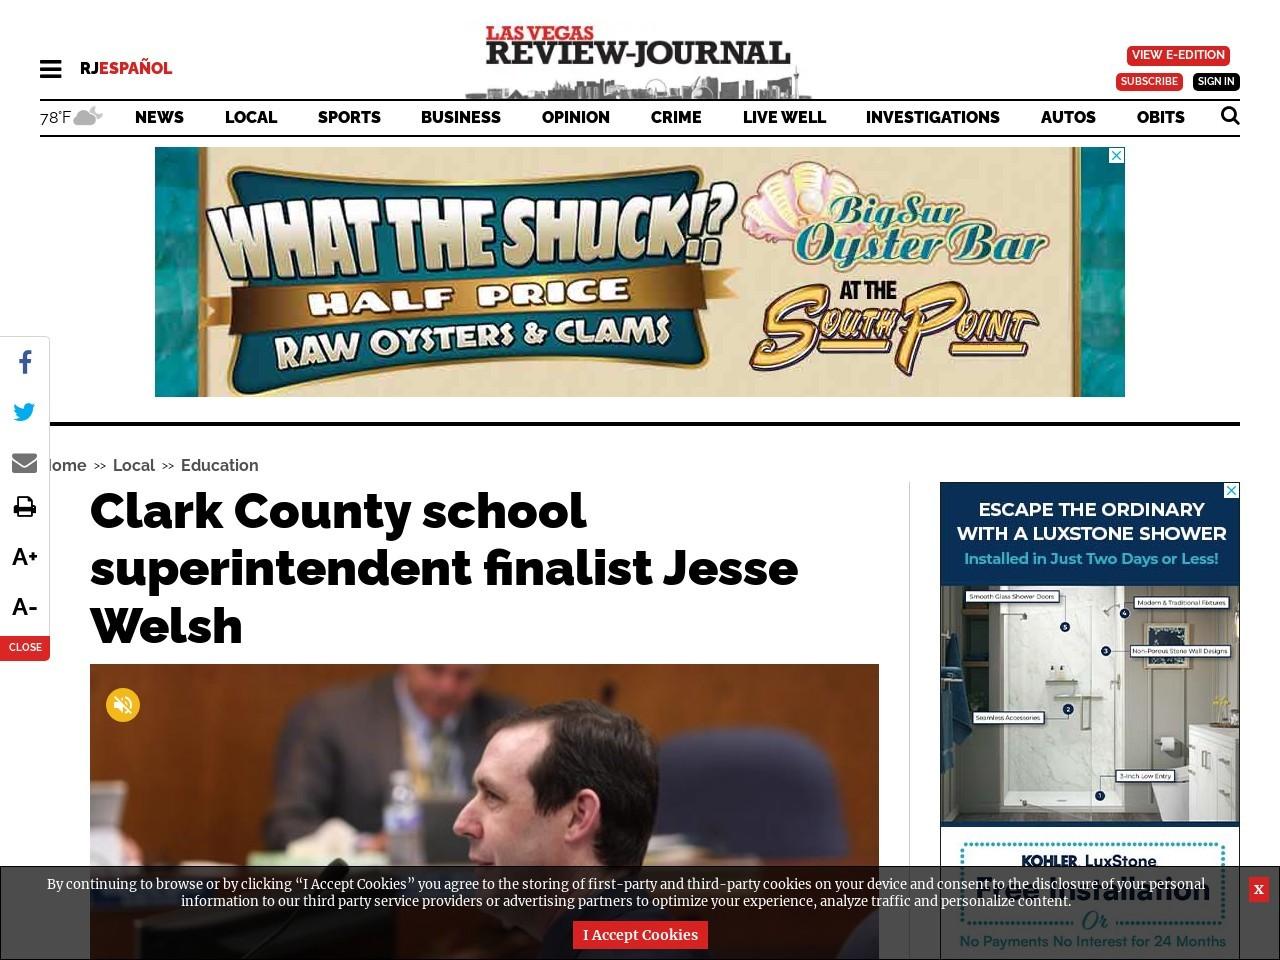 Clark County school superintendent finalist Jesse Welsh